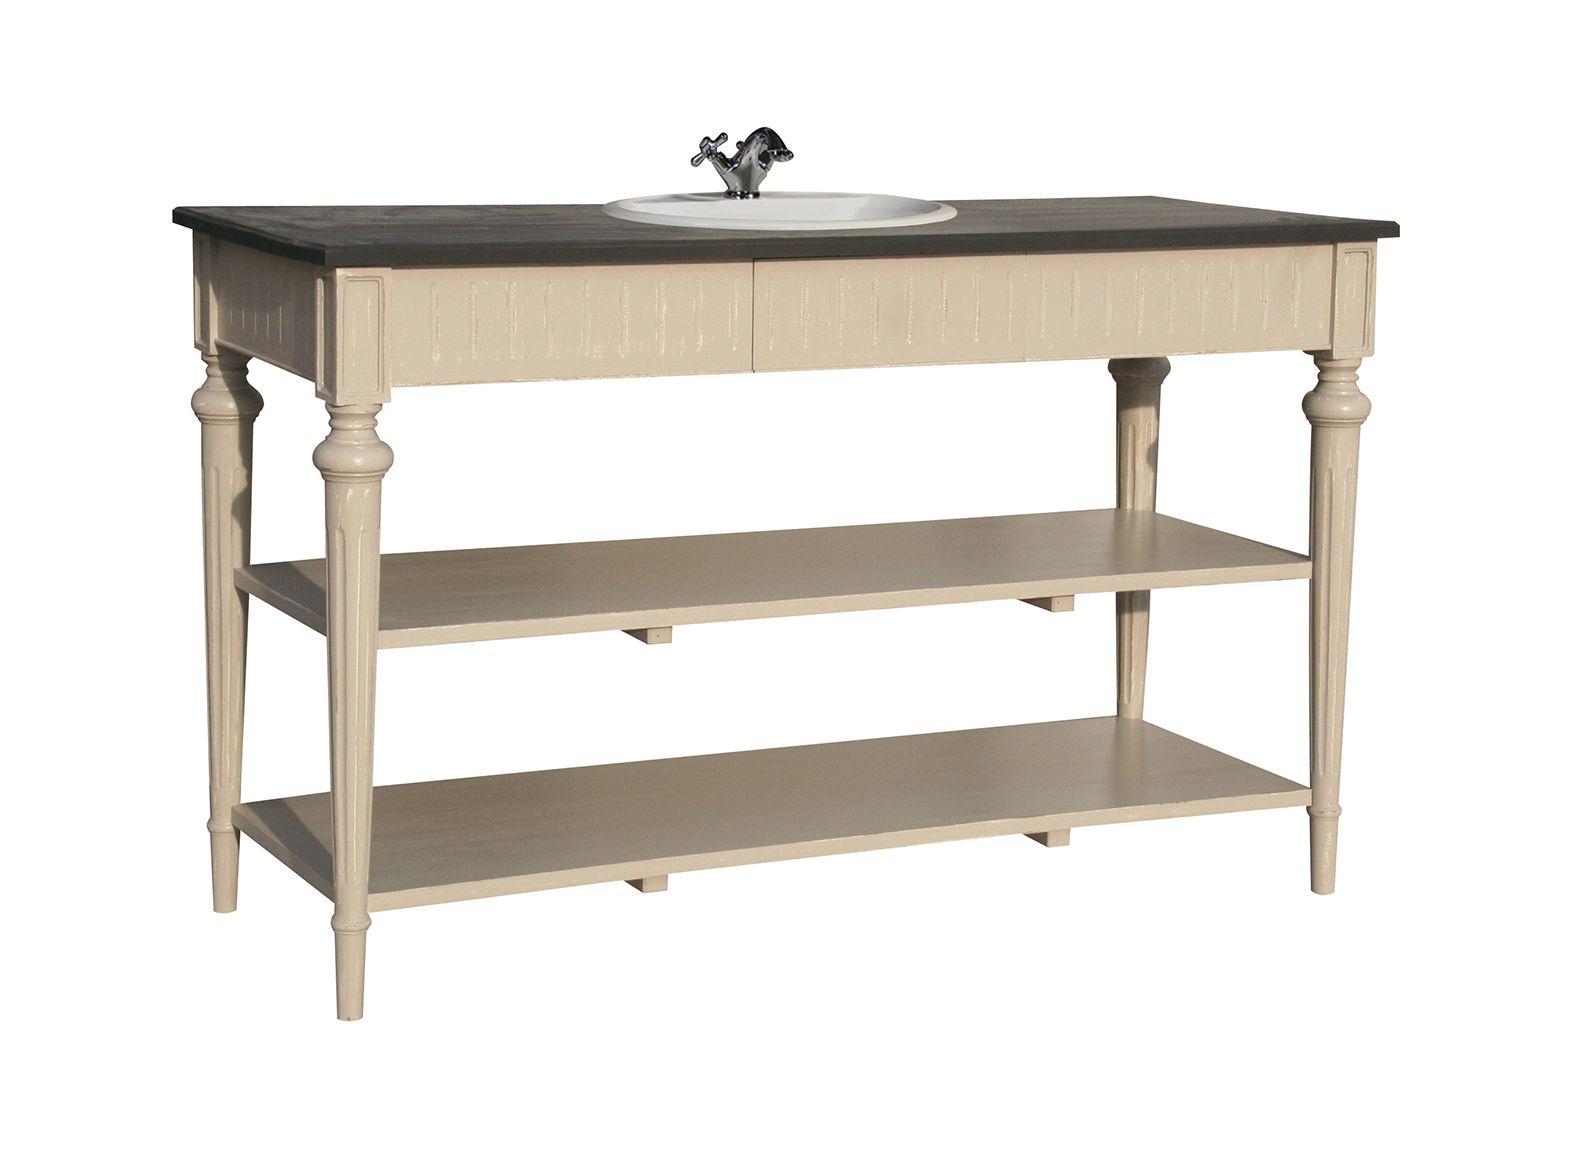 Meuble salle de bain signature georges - Signature meubles ...